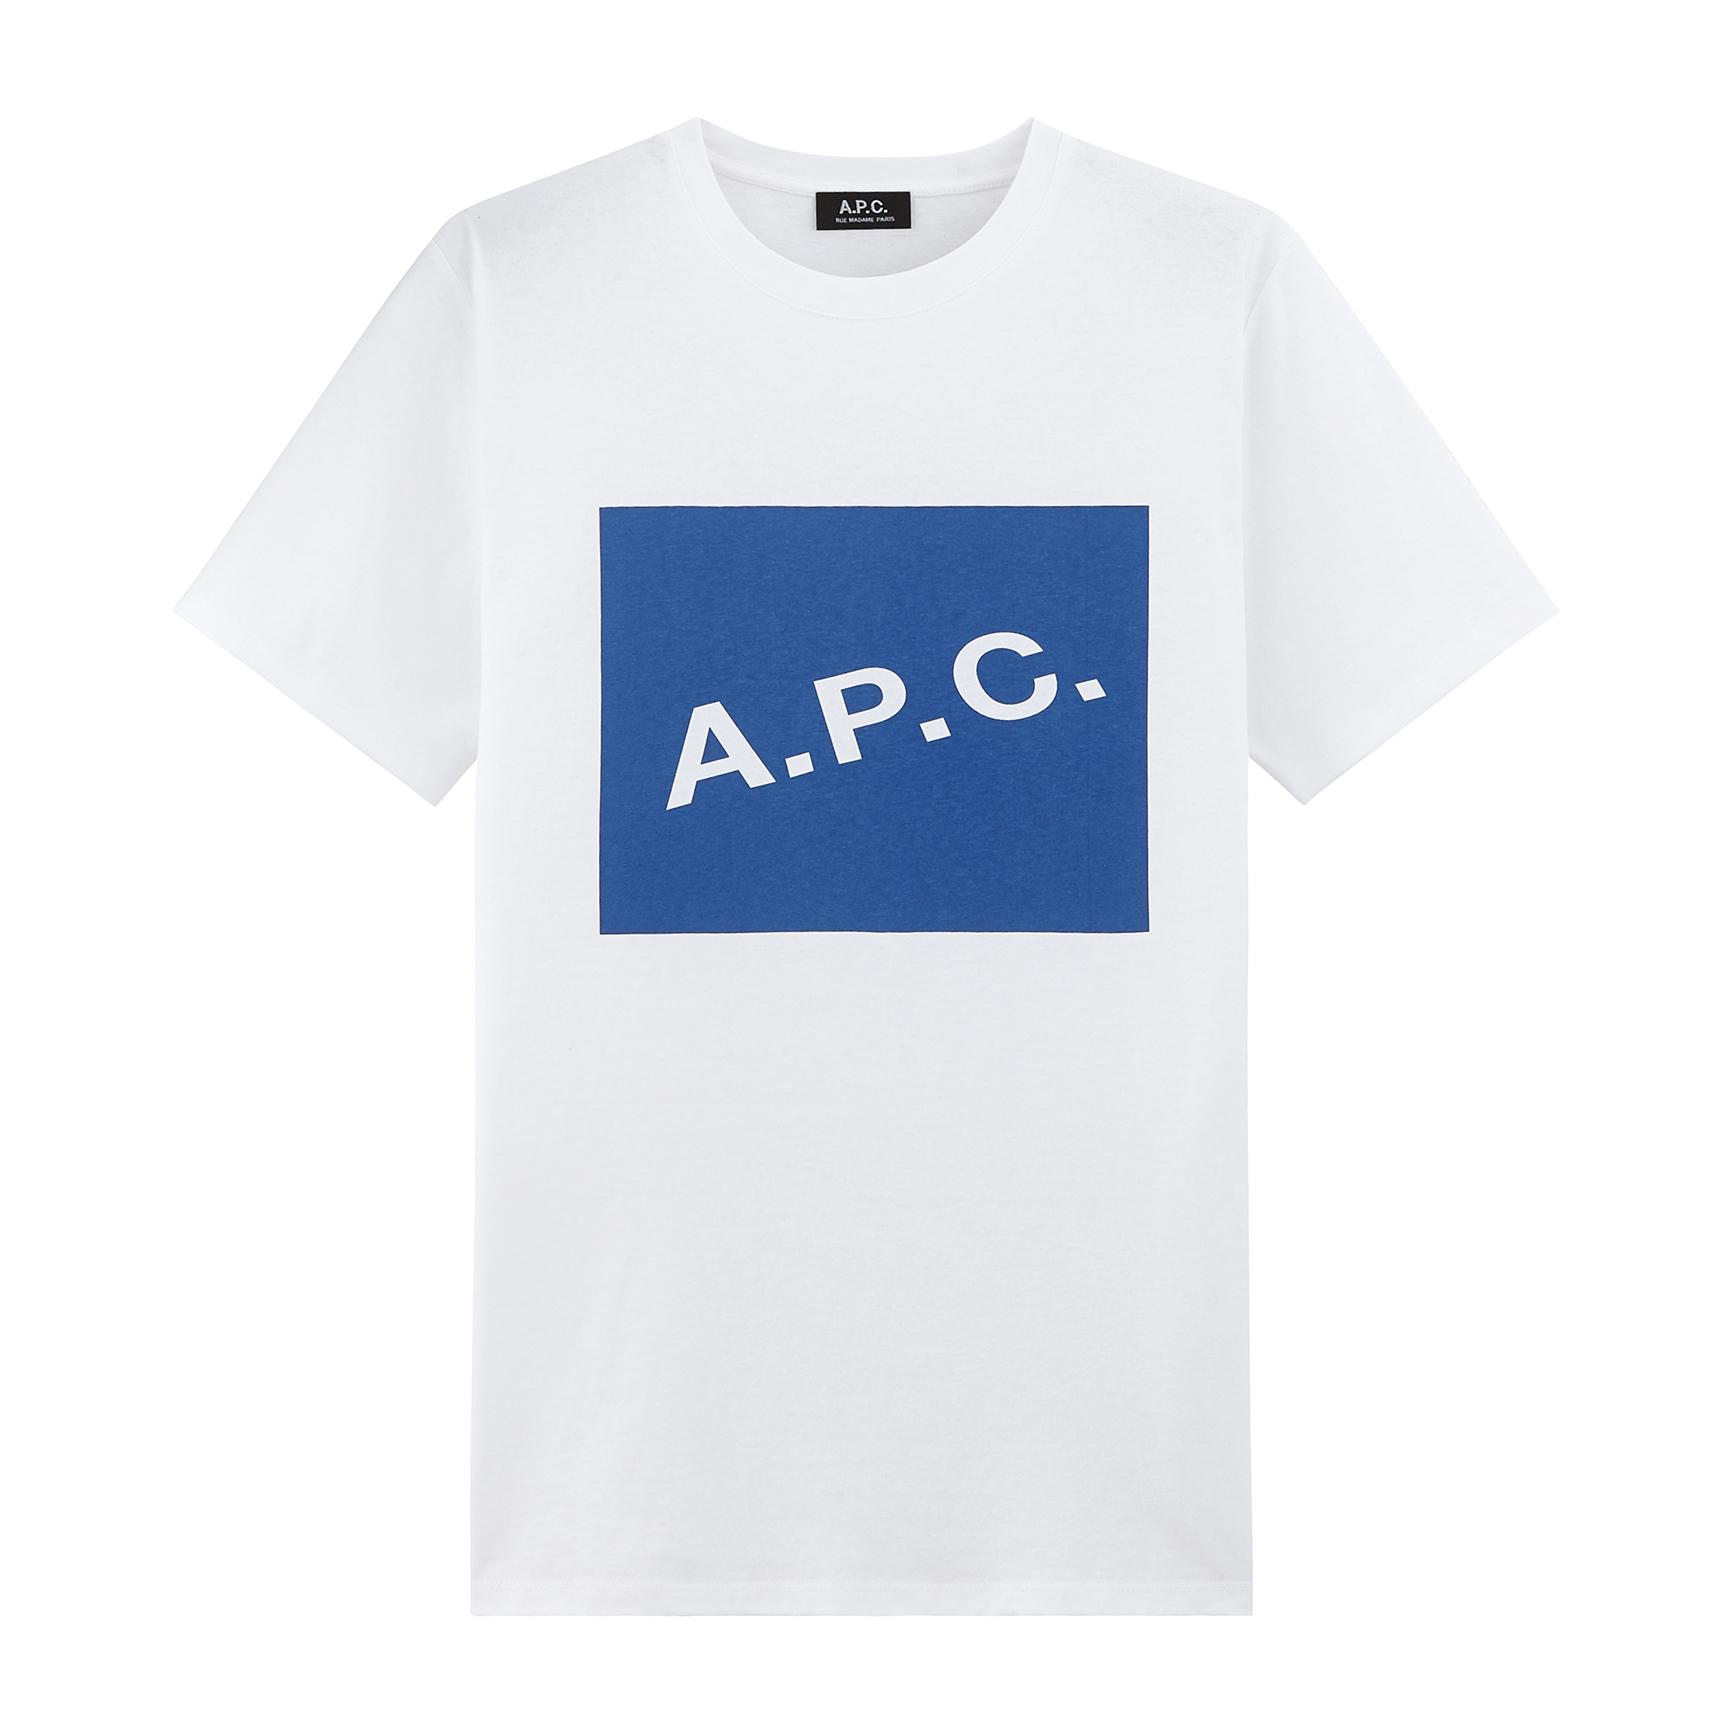 A.P.C. / Kraft 18p Tee -darkblue